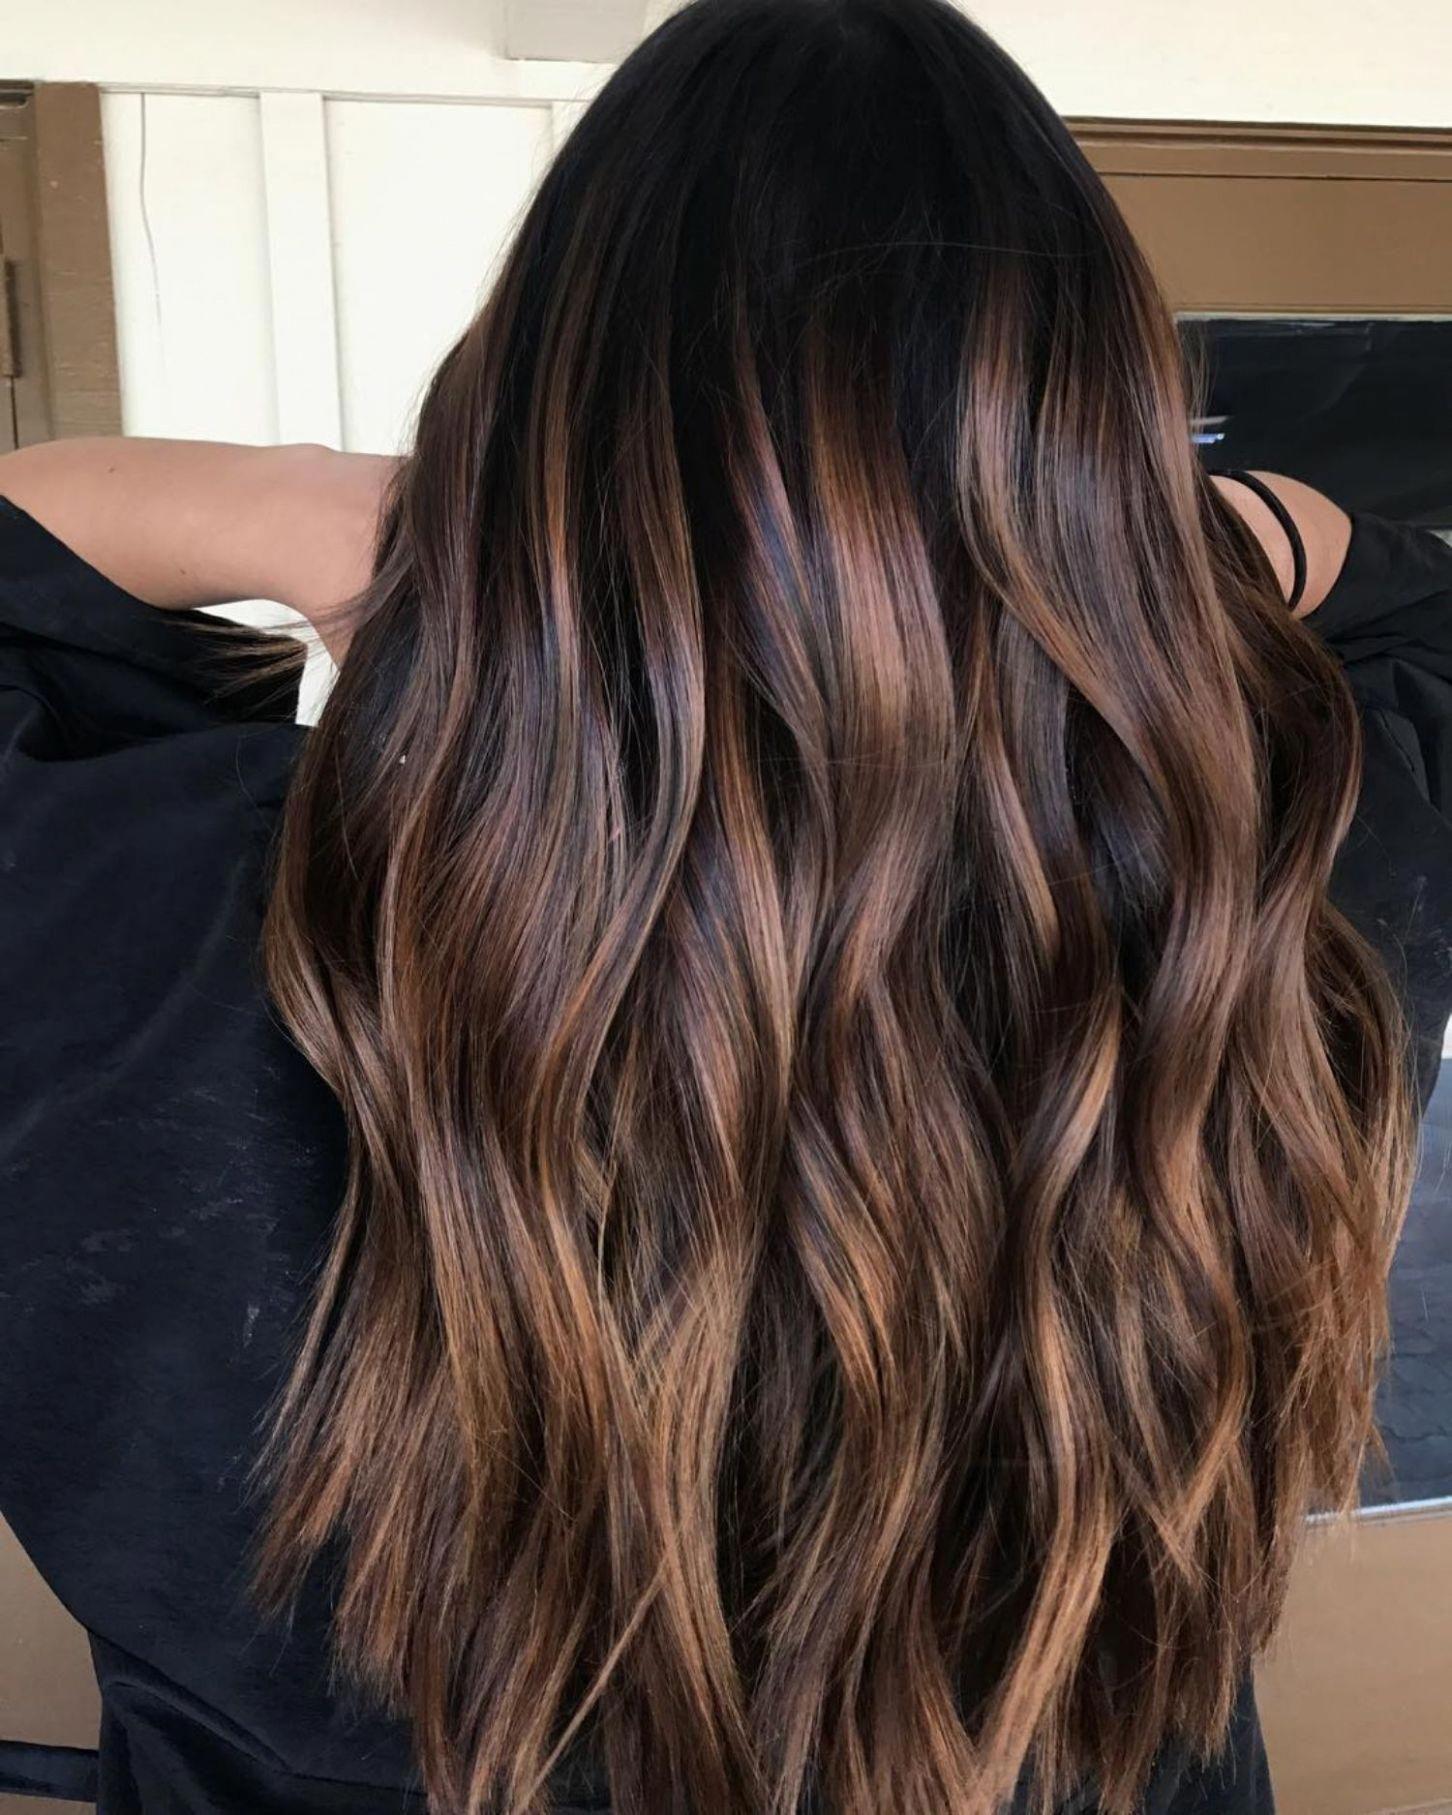 60 Hairstyles Featuring Dark Brown Hair With Highlights Darkbrownhair Hair Color For Black Hair Hair Styles Long Brown Hair